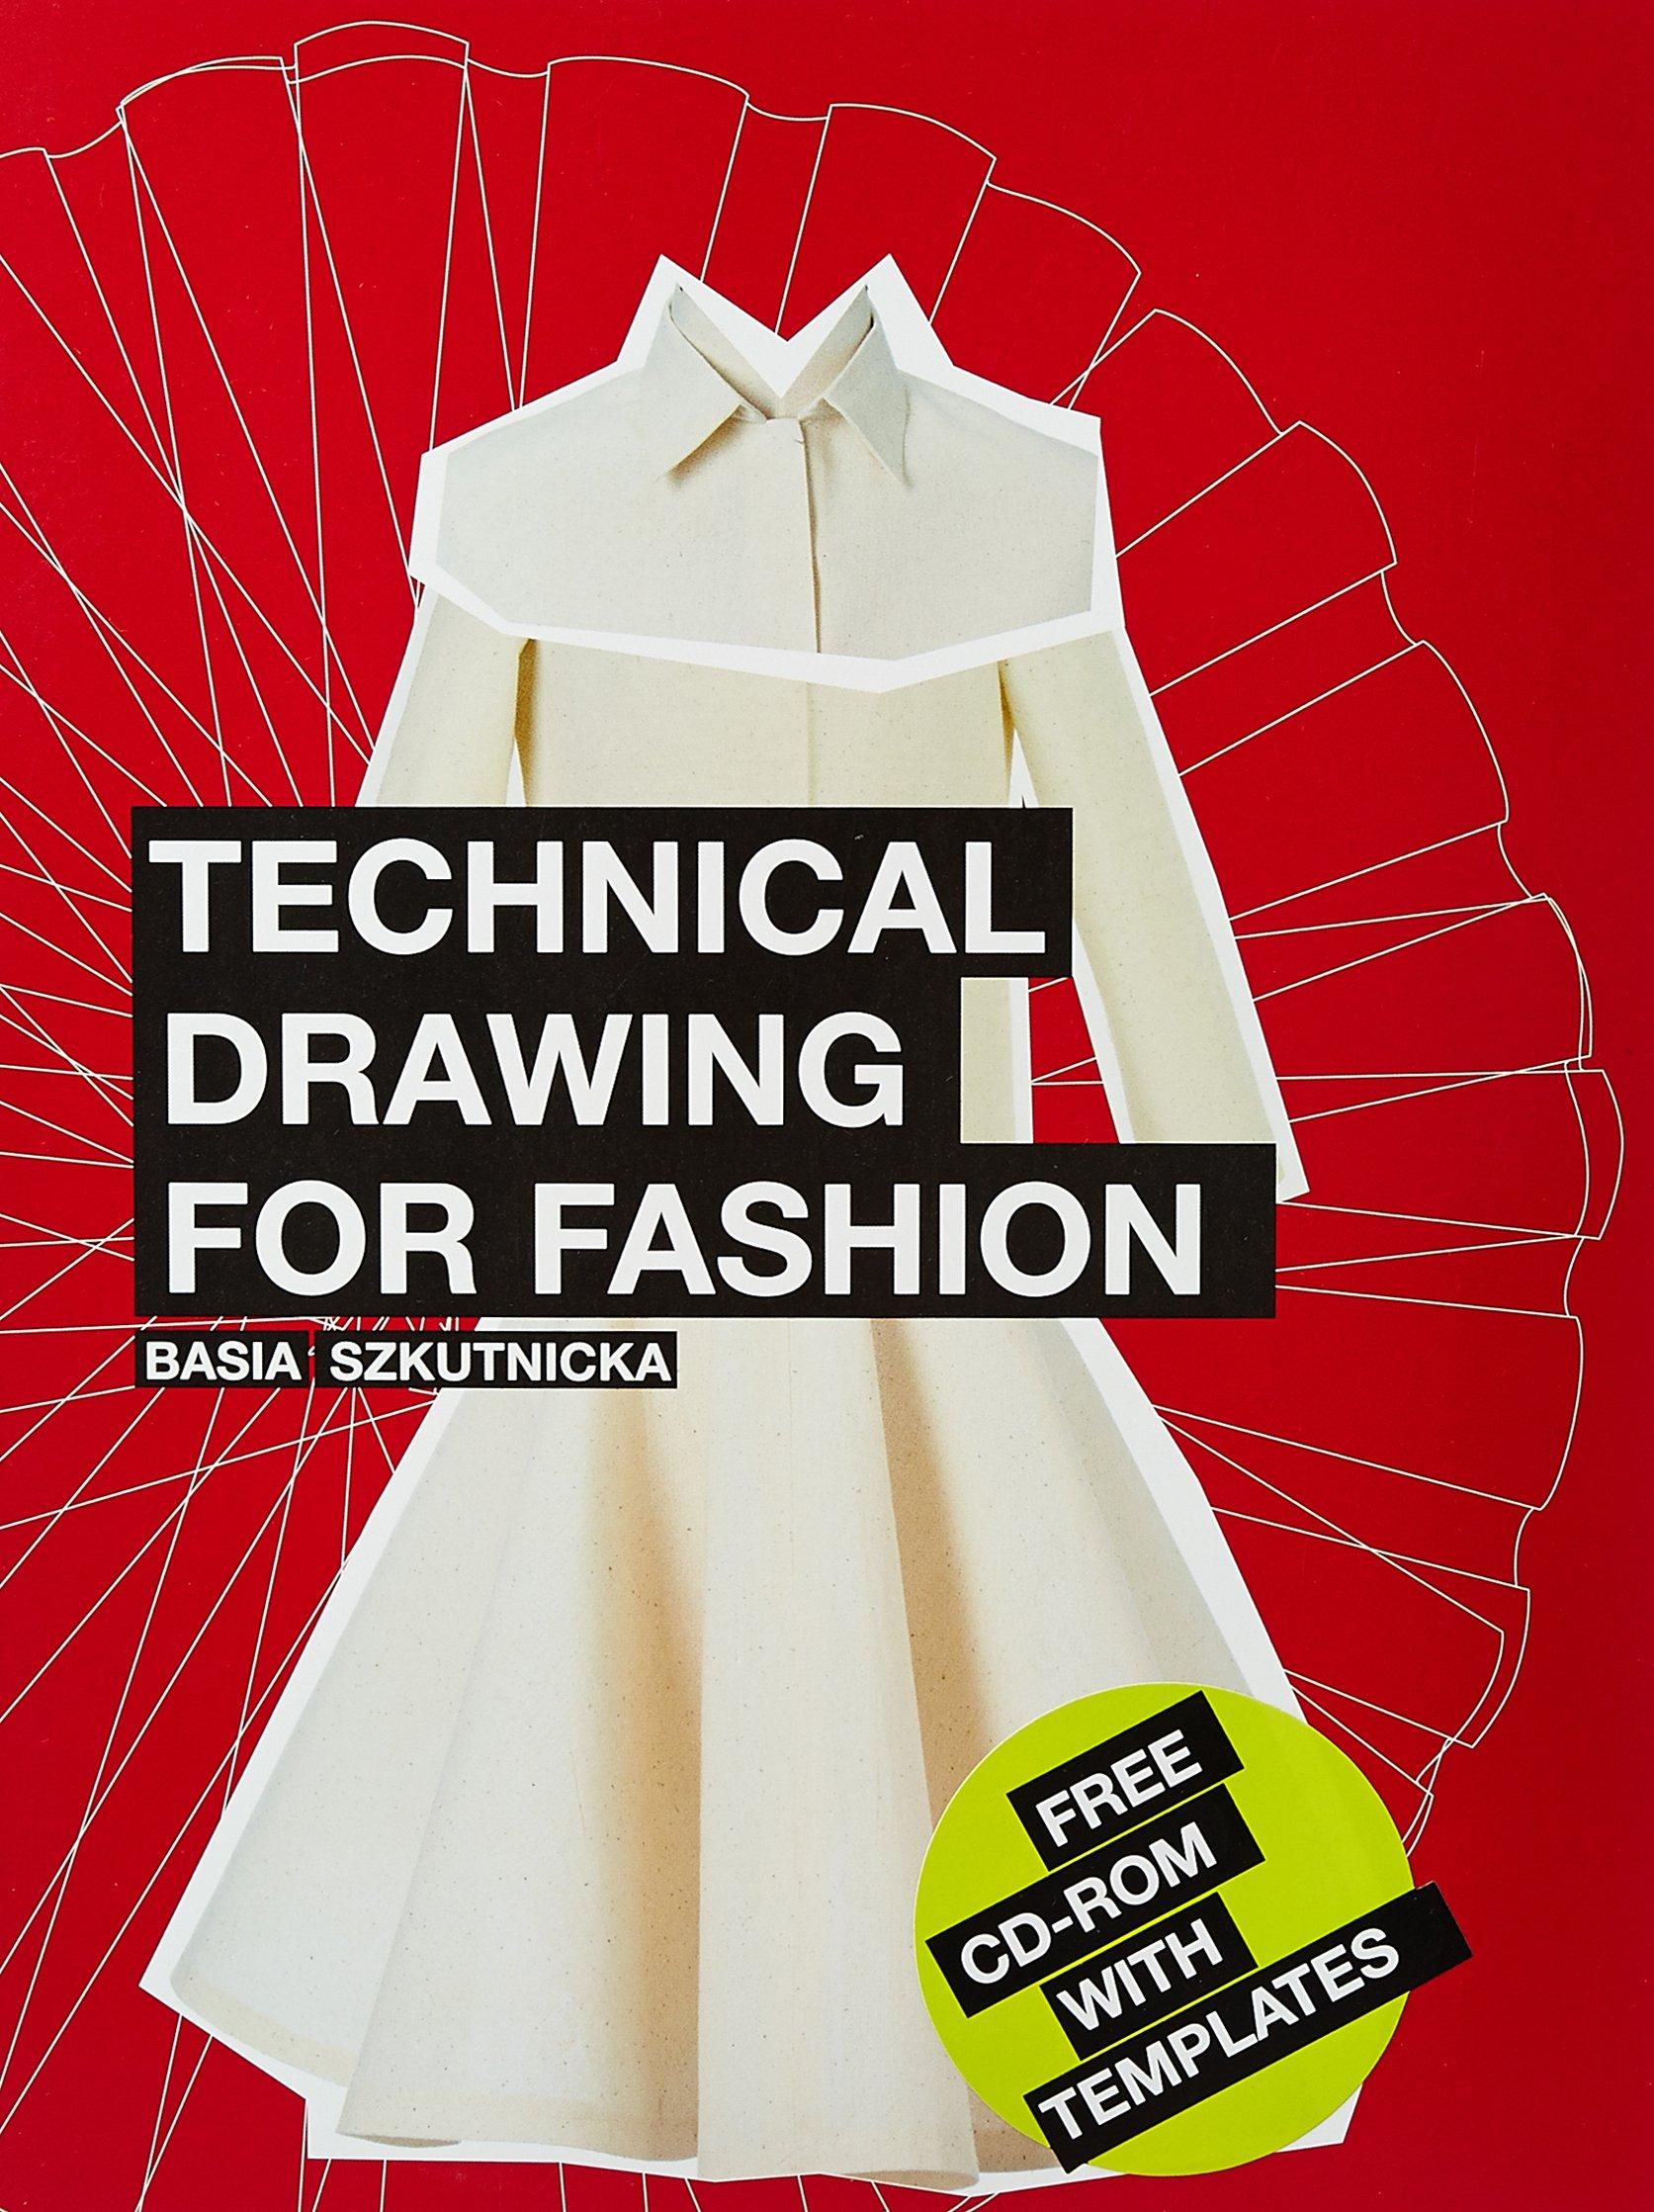 Flats Technical Drawing For Fashion Portfolio Skills Fashion Textiles Szkutnicka Basia 9781856696180 Amazon Com Books